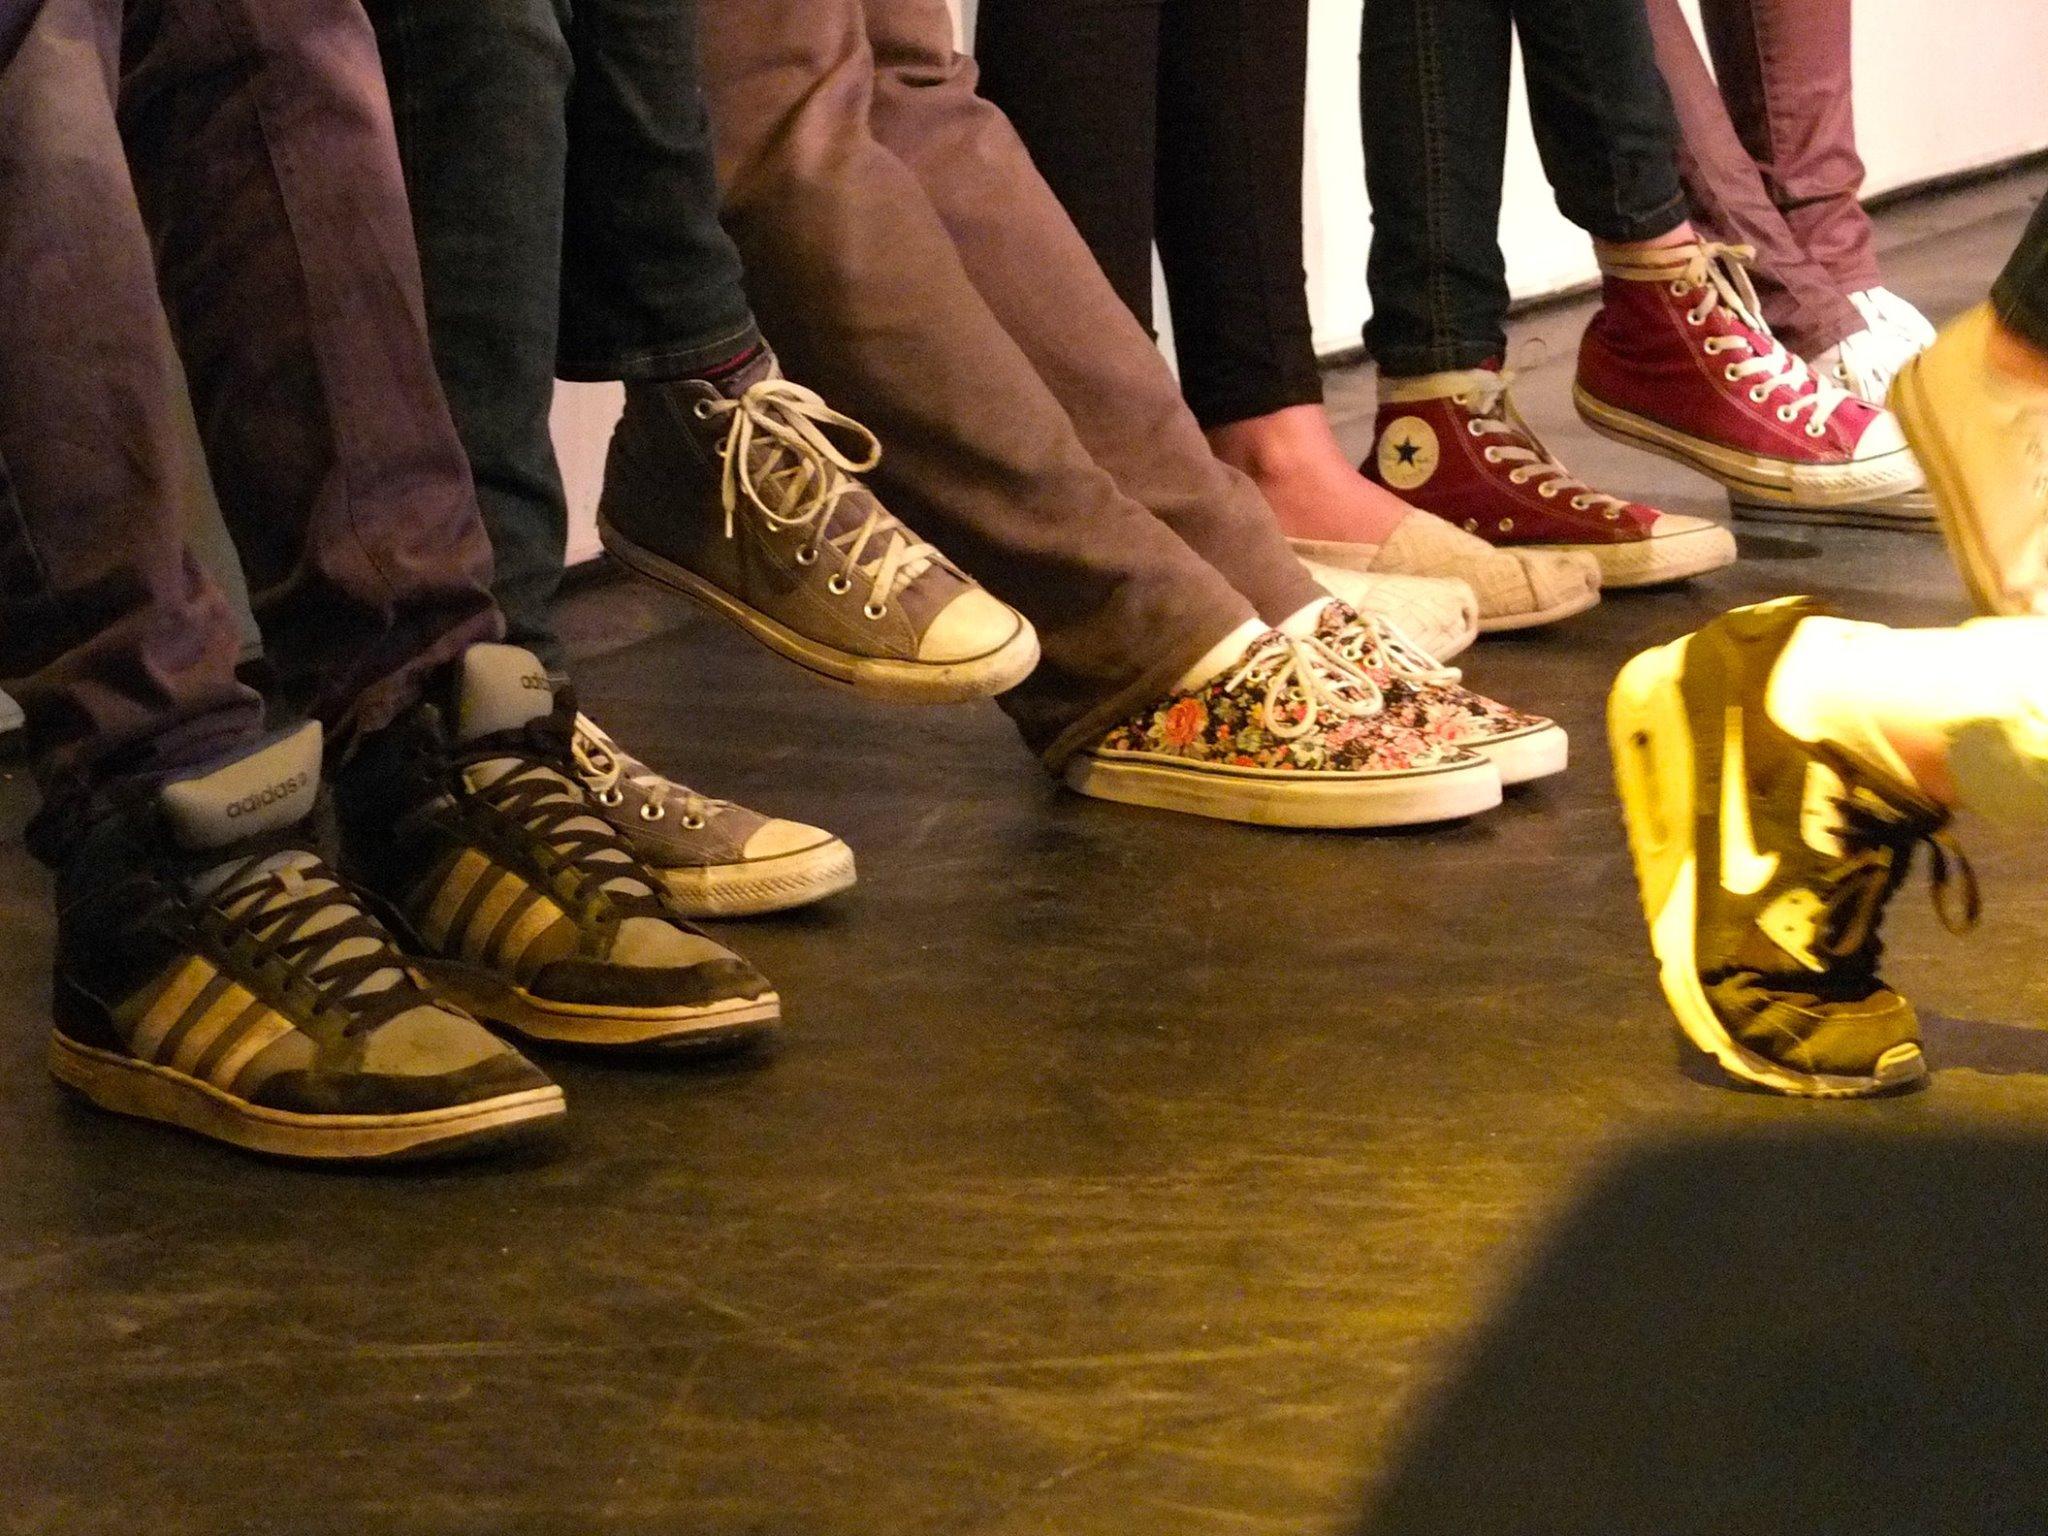 15.00-17.00: Unge Stemmer på Tøyen  Workshop & Scratch visninger  for barn 10-15 år  Biblo Tøyen